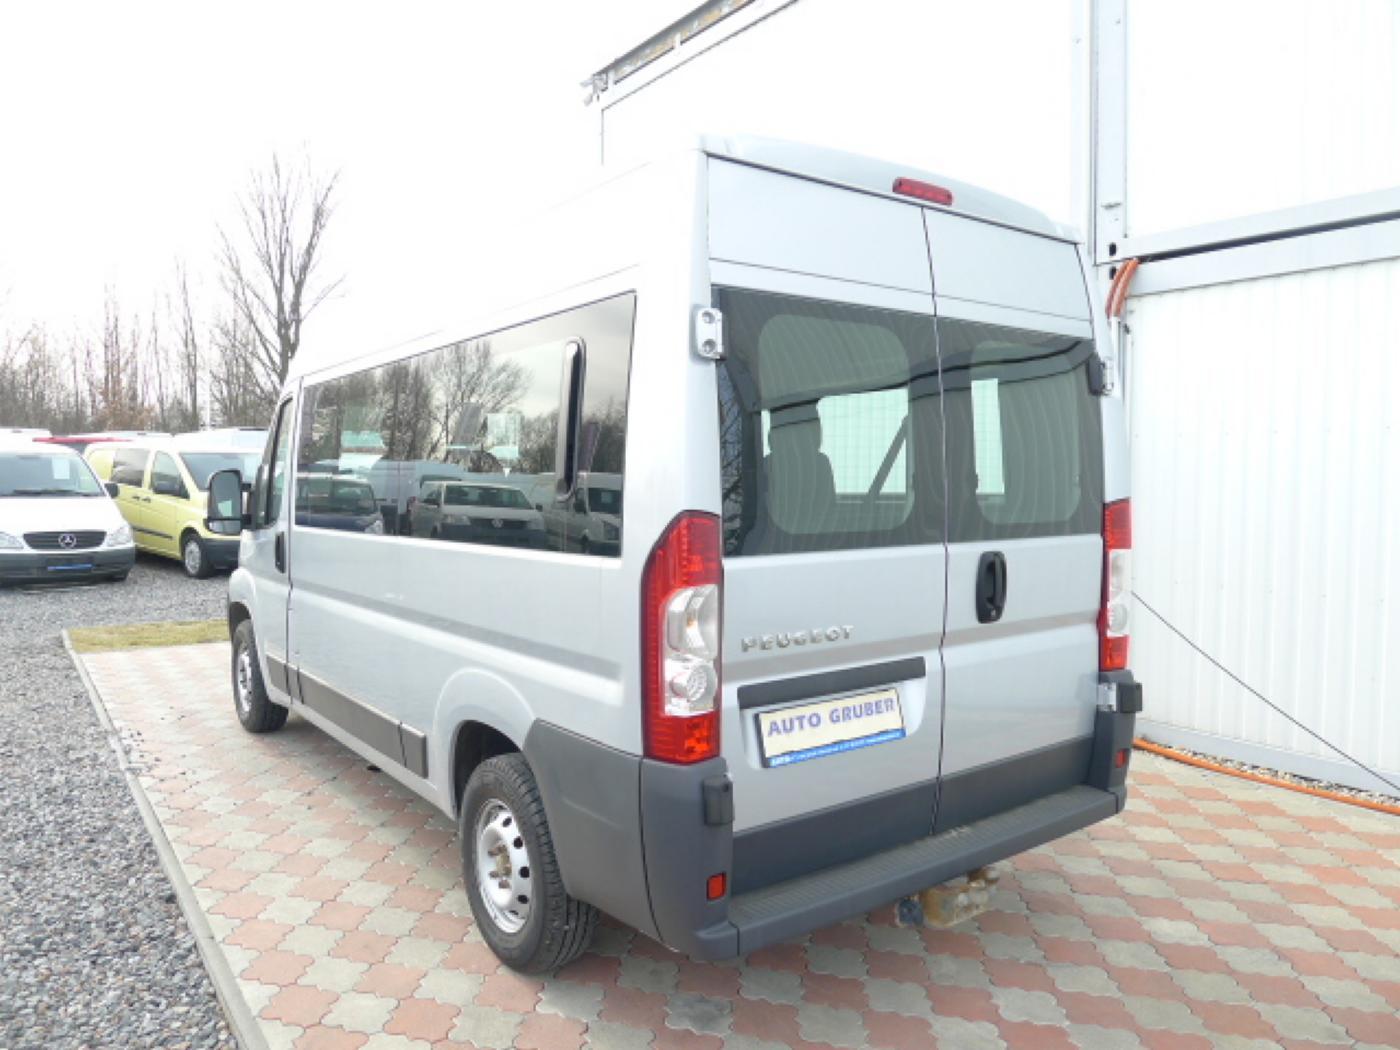 Peugeot Boxer 2,2 HDI PANORAMA 8míst+2 x klima+We - 4